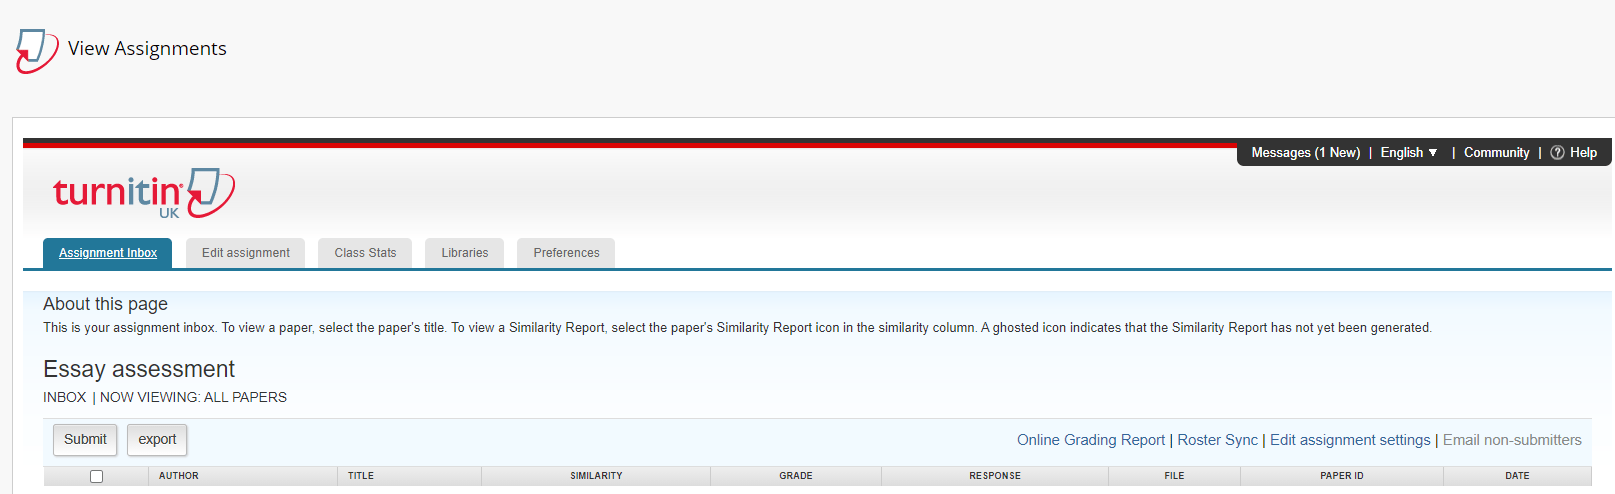 Screenshot showing the Turnitin inbox in Blackboard.